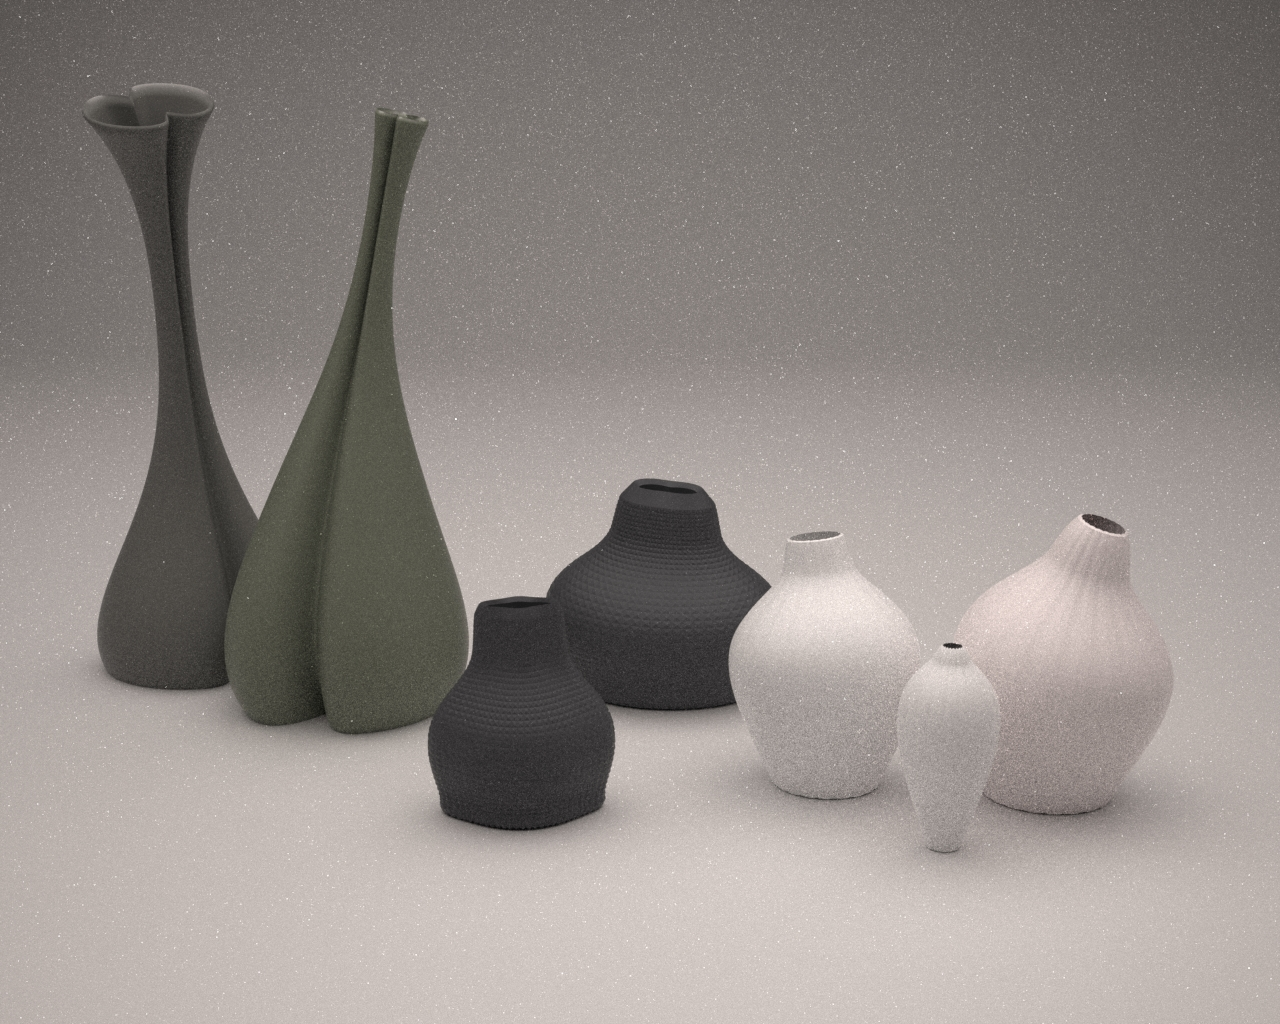 Specimina, design by Valerio Sommella, 2011.